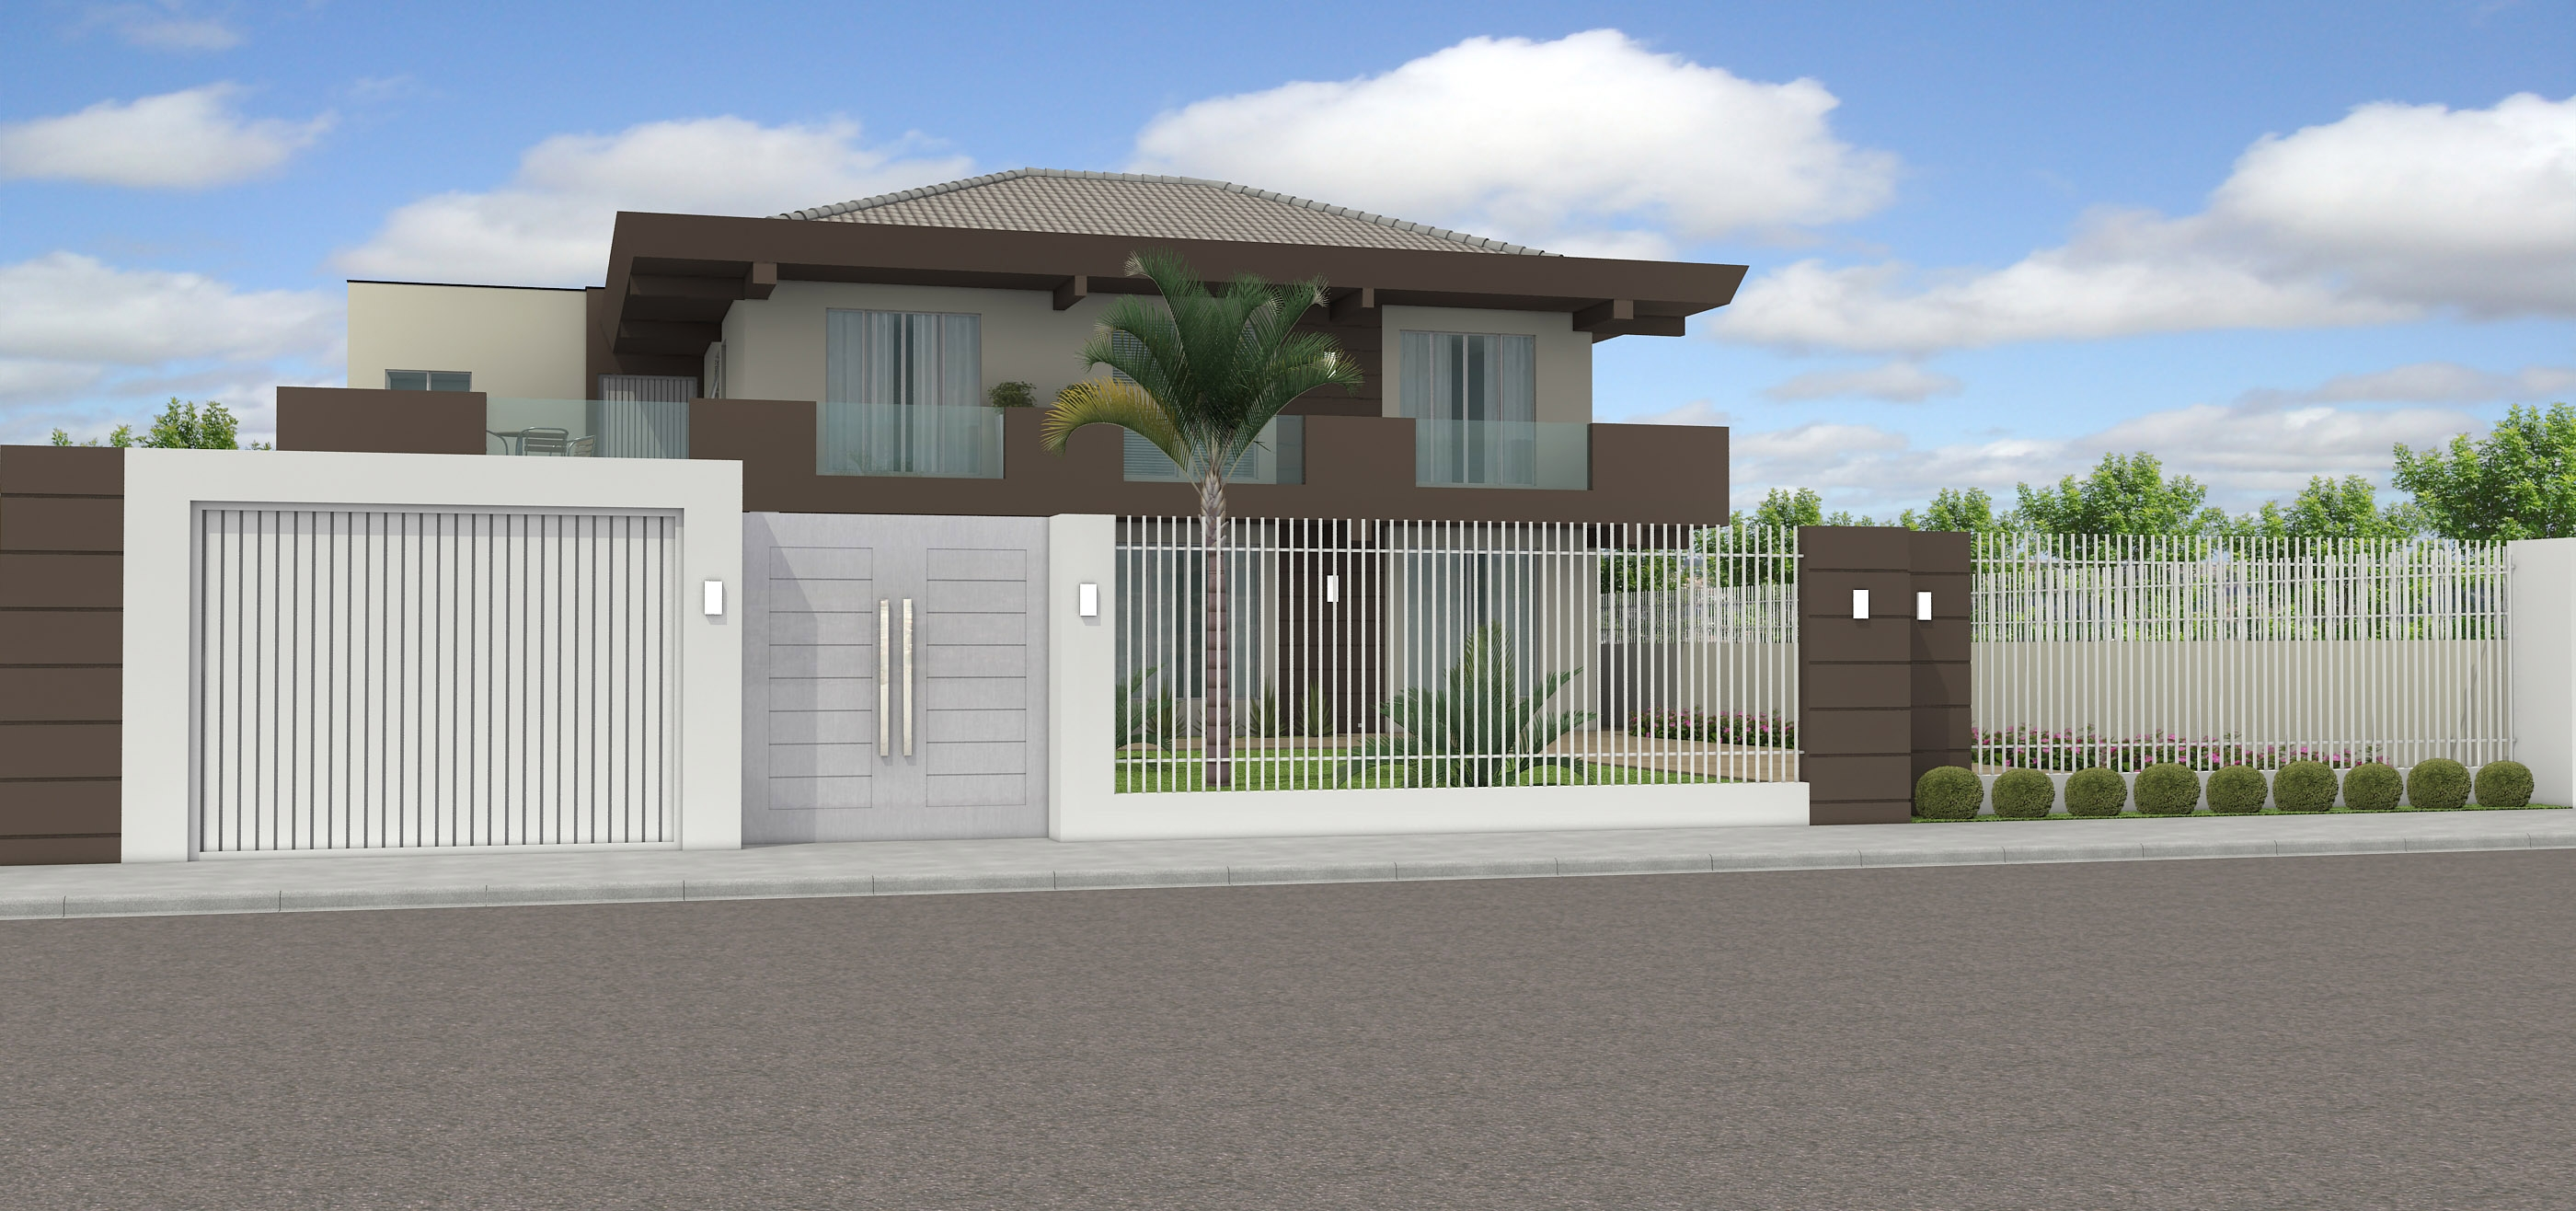 15 muros modernos para casas for Casas modernas 2015